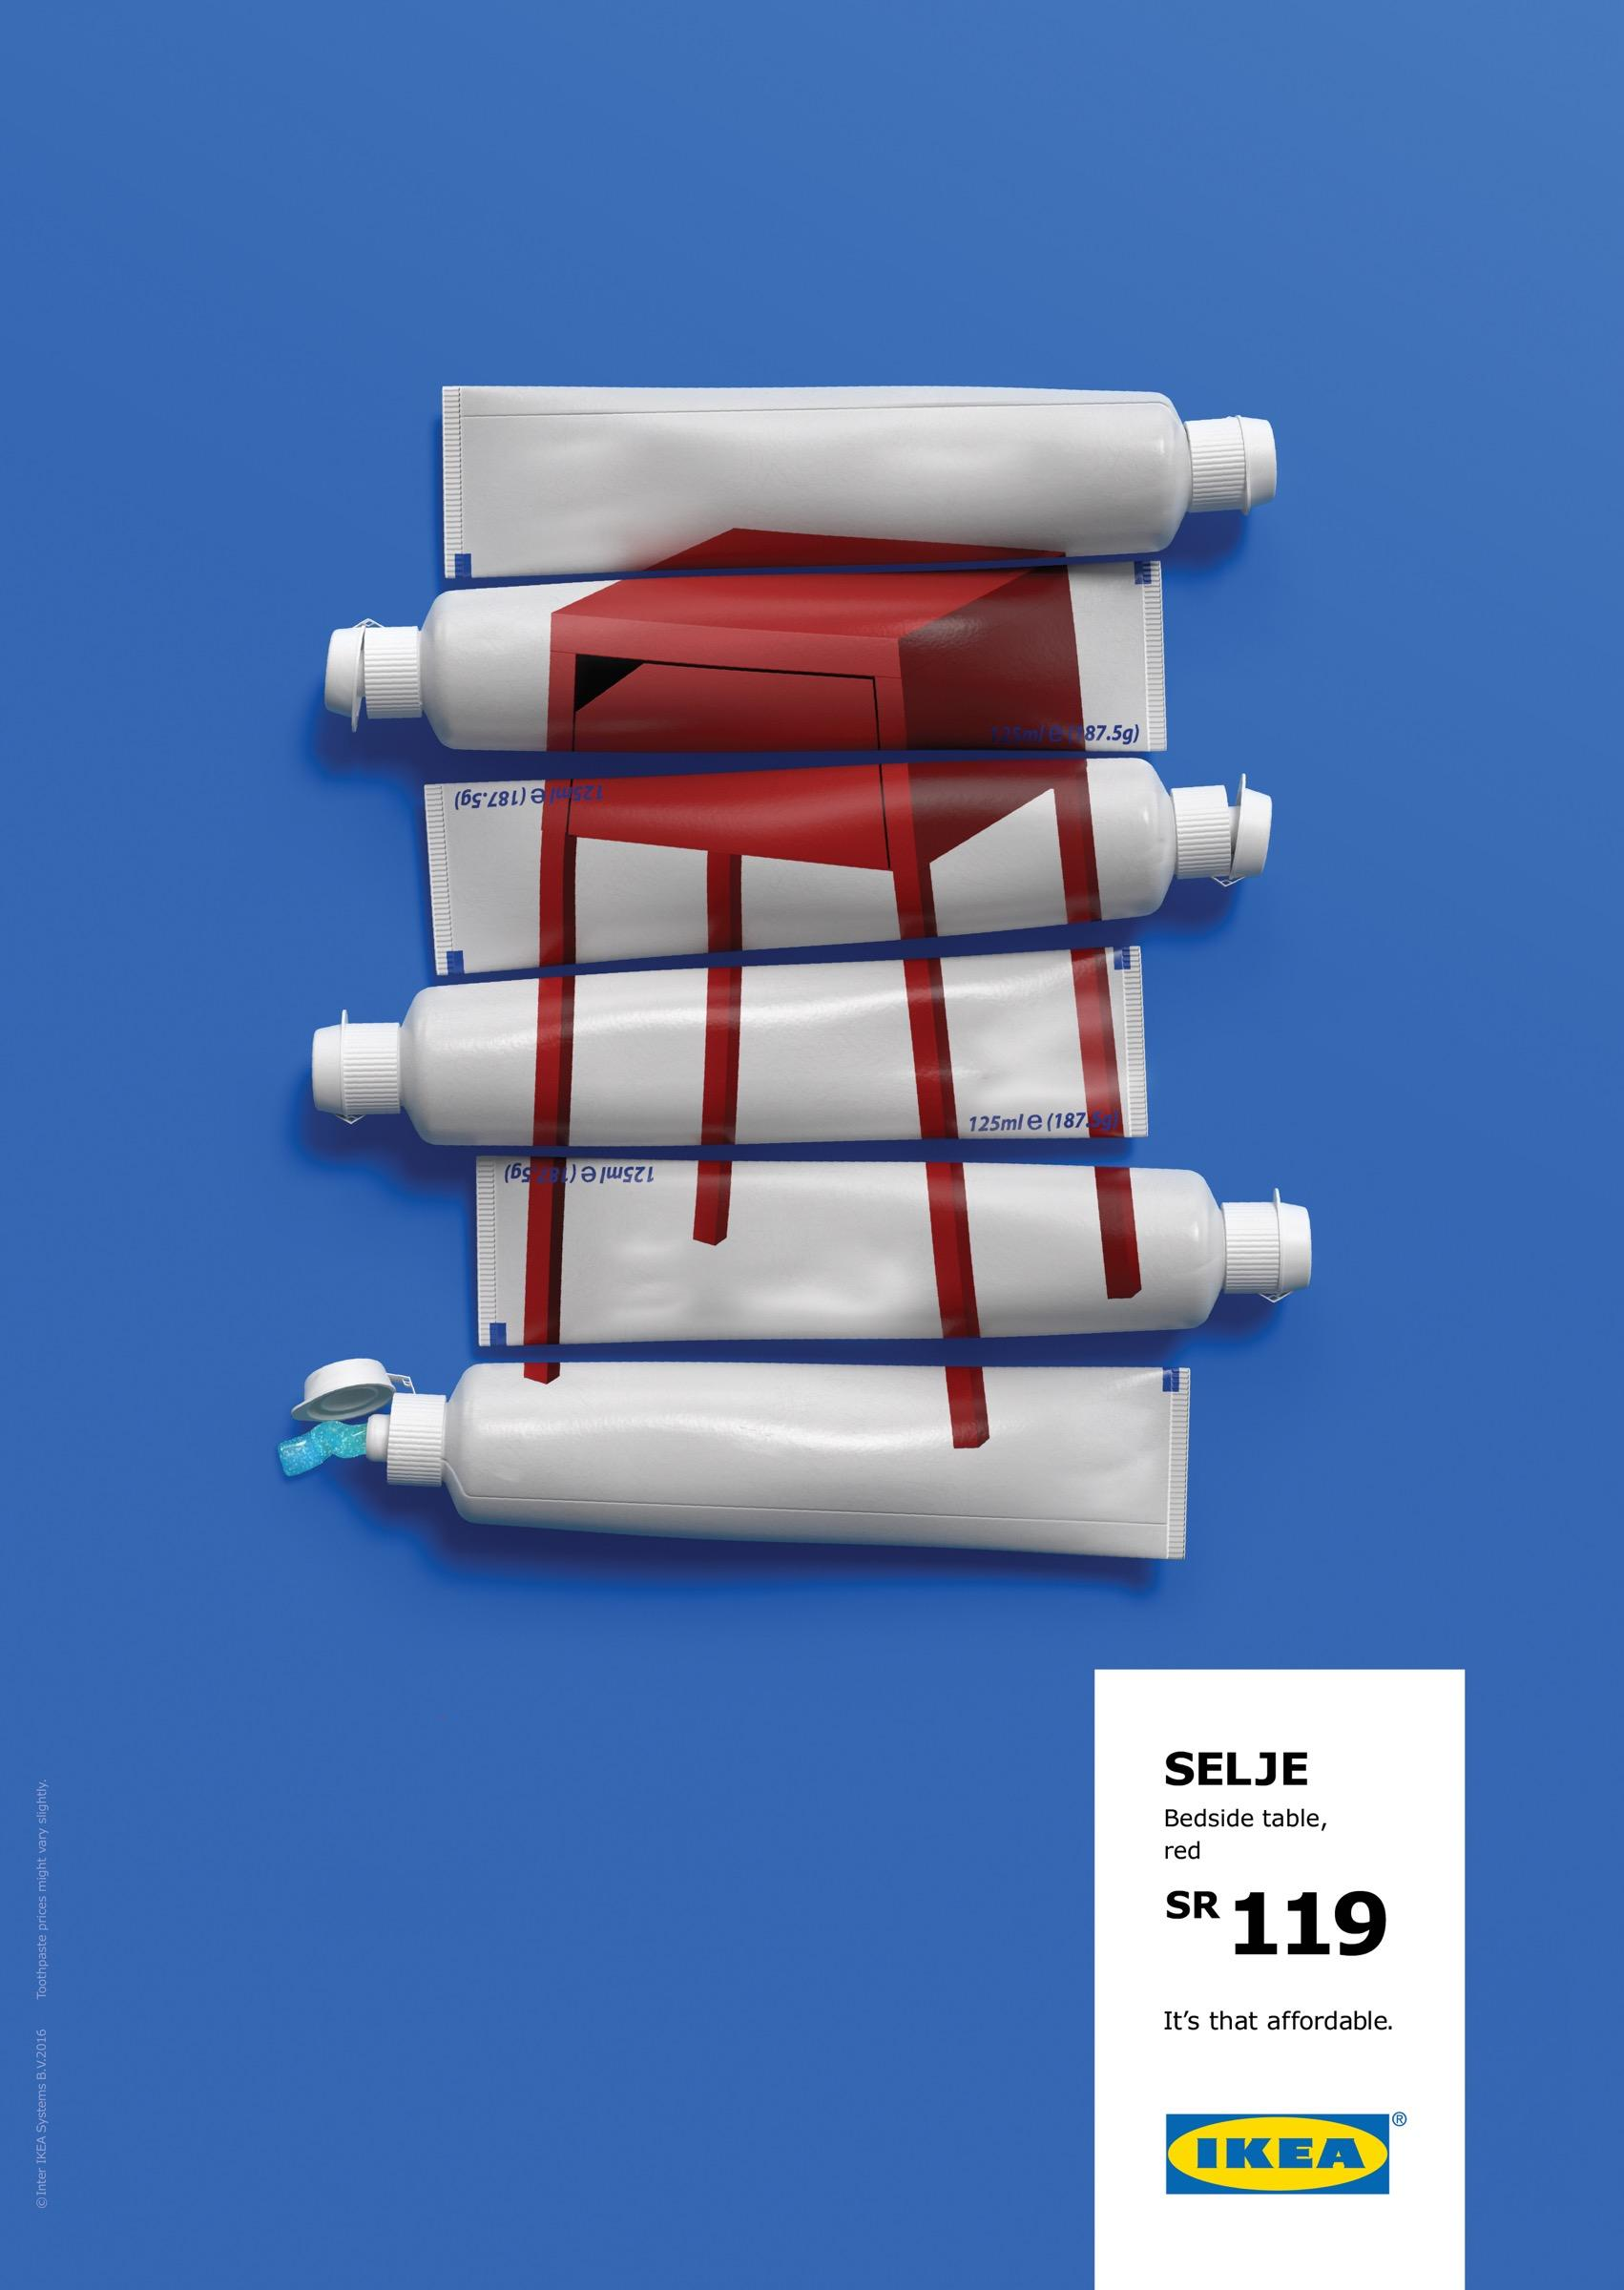 IKEA Print Ad - Nightstand